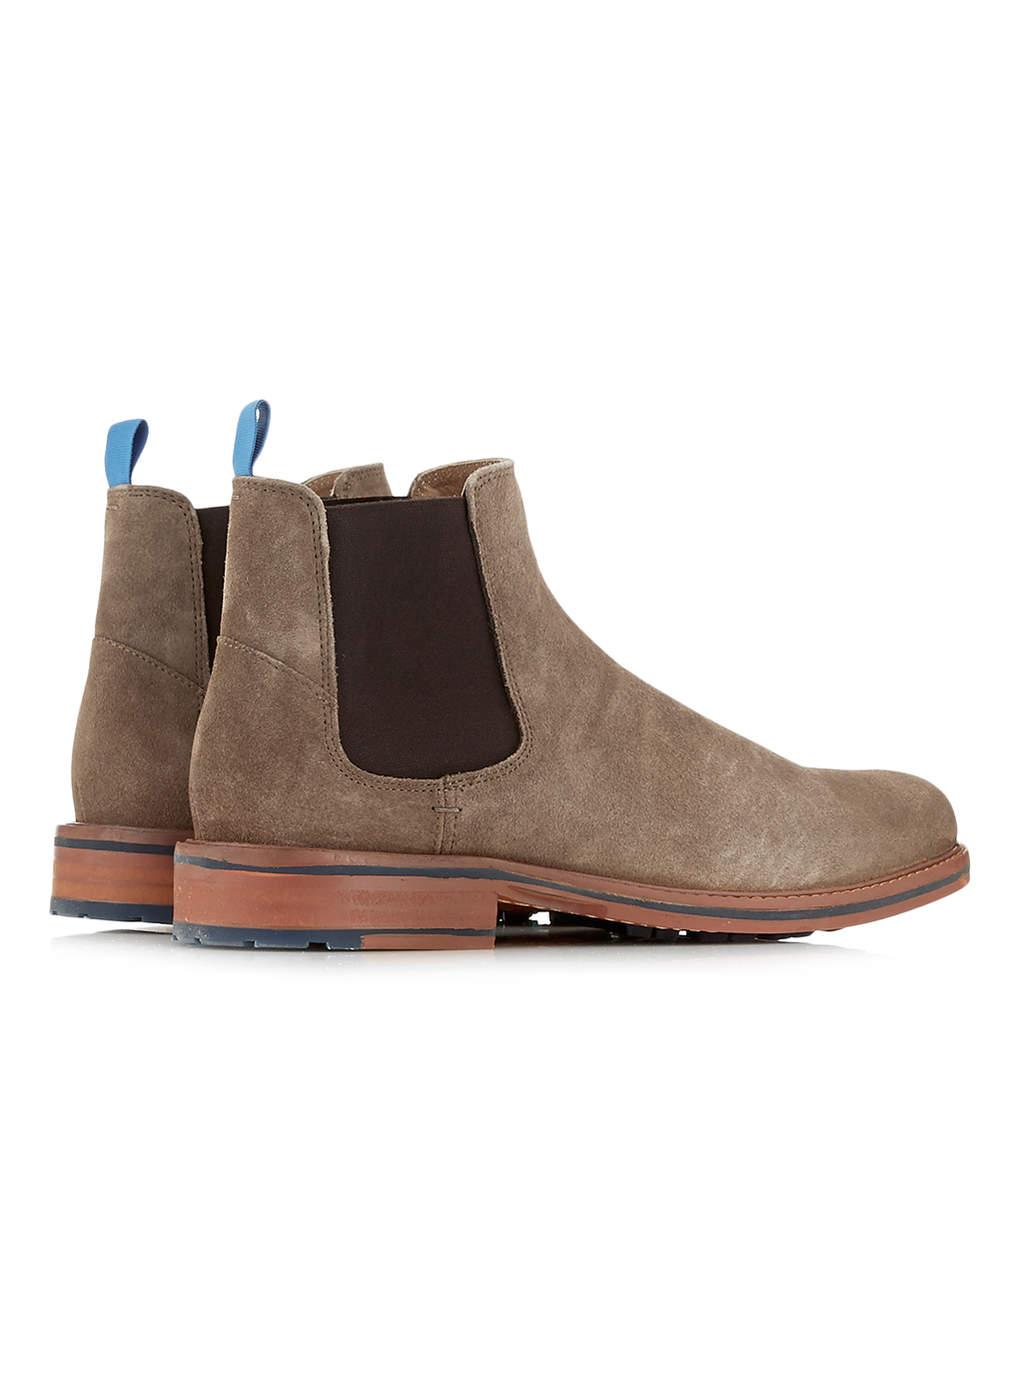 Ben Sherman Light Brown Suede Chelsea Boots For Men Lyst